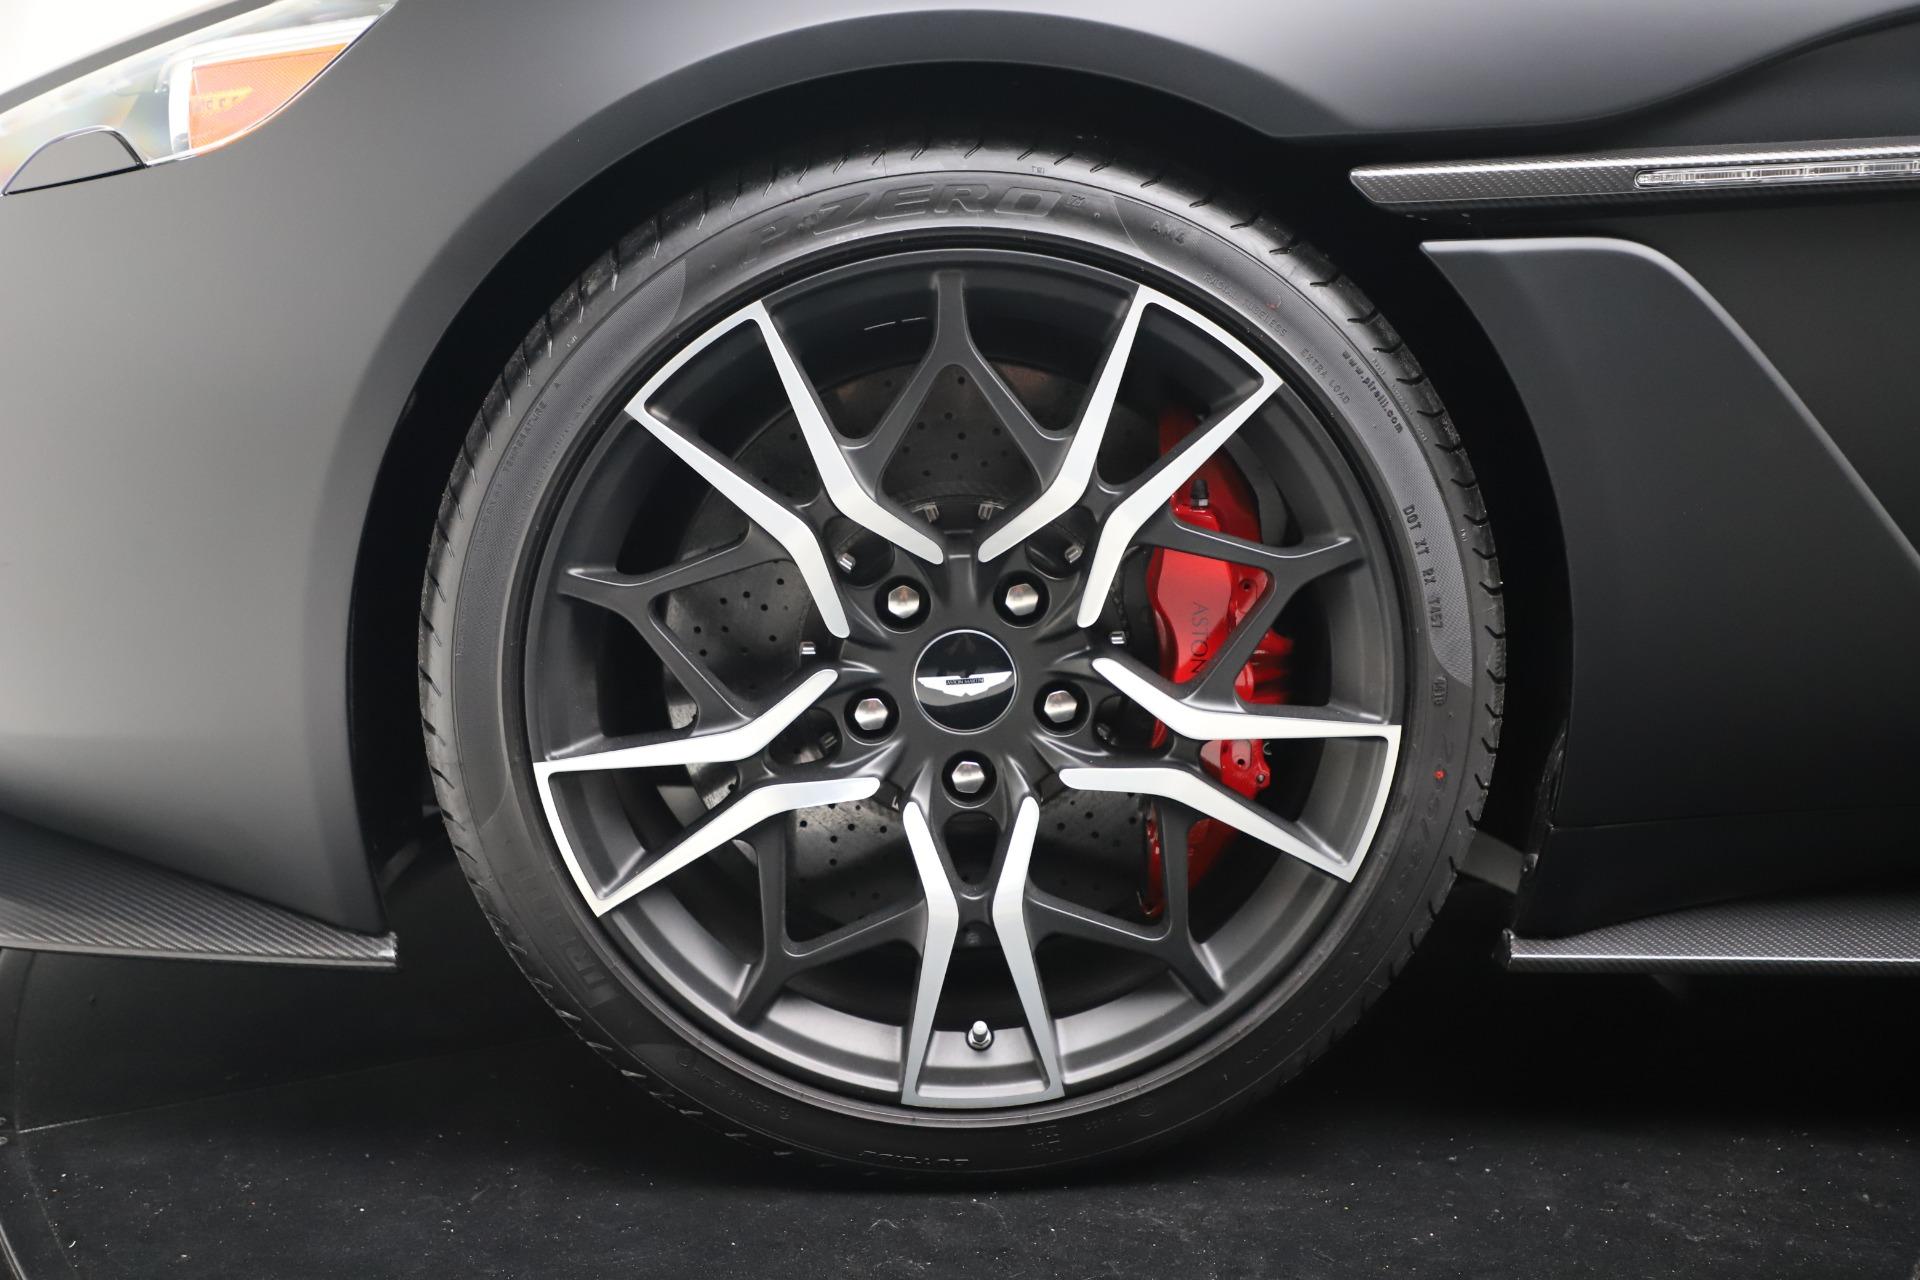 New 2019 Aston Martin Vanquish Shooting Brake For Sale In Westport, CT 3512_p57